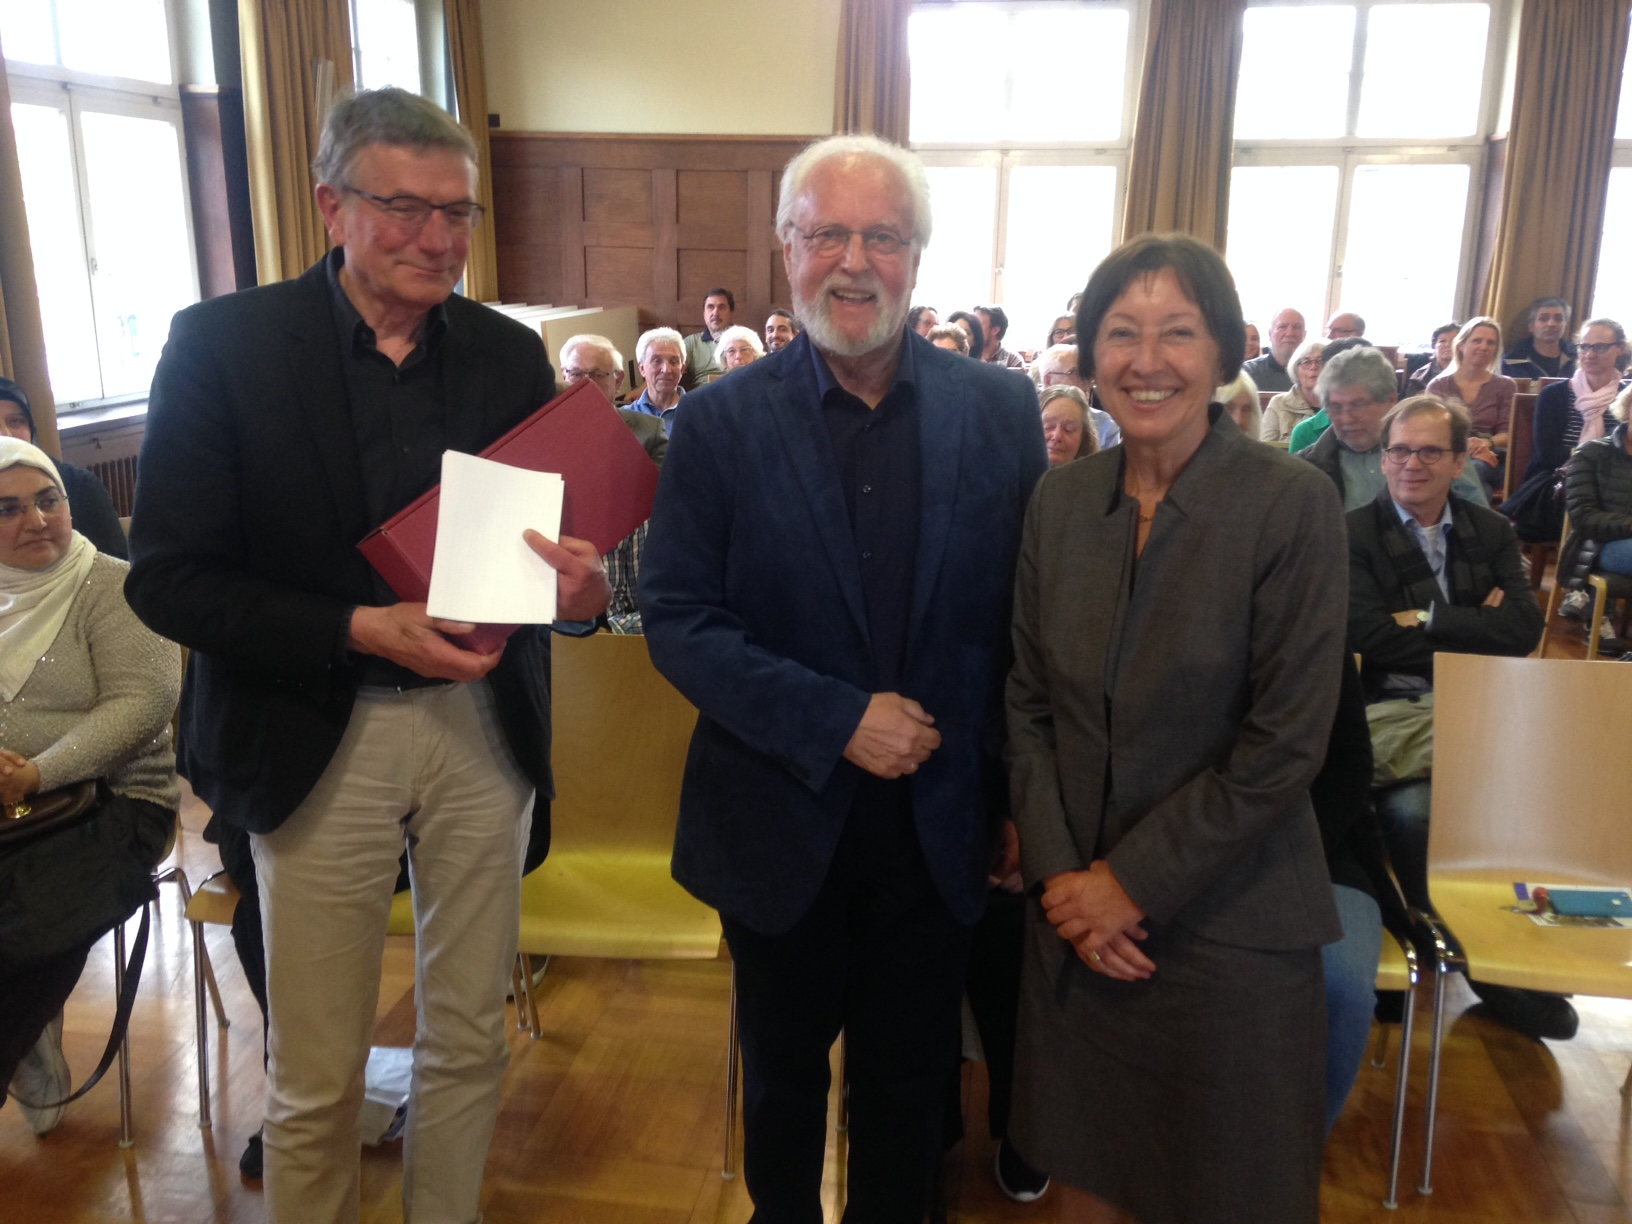 Jörg Armbruster, Pfarrer Ulrich Kadelbach als Verantwortlicher und Bezirksvorsteherin Andrea Klöber